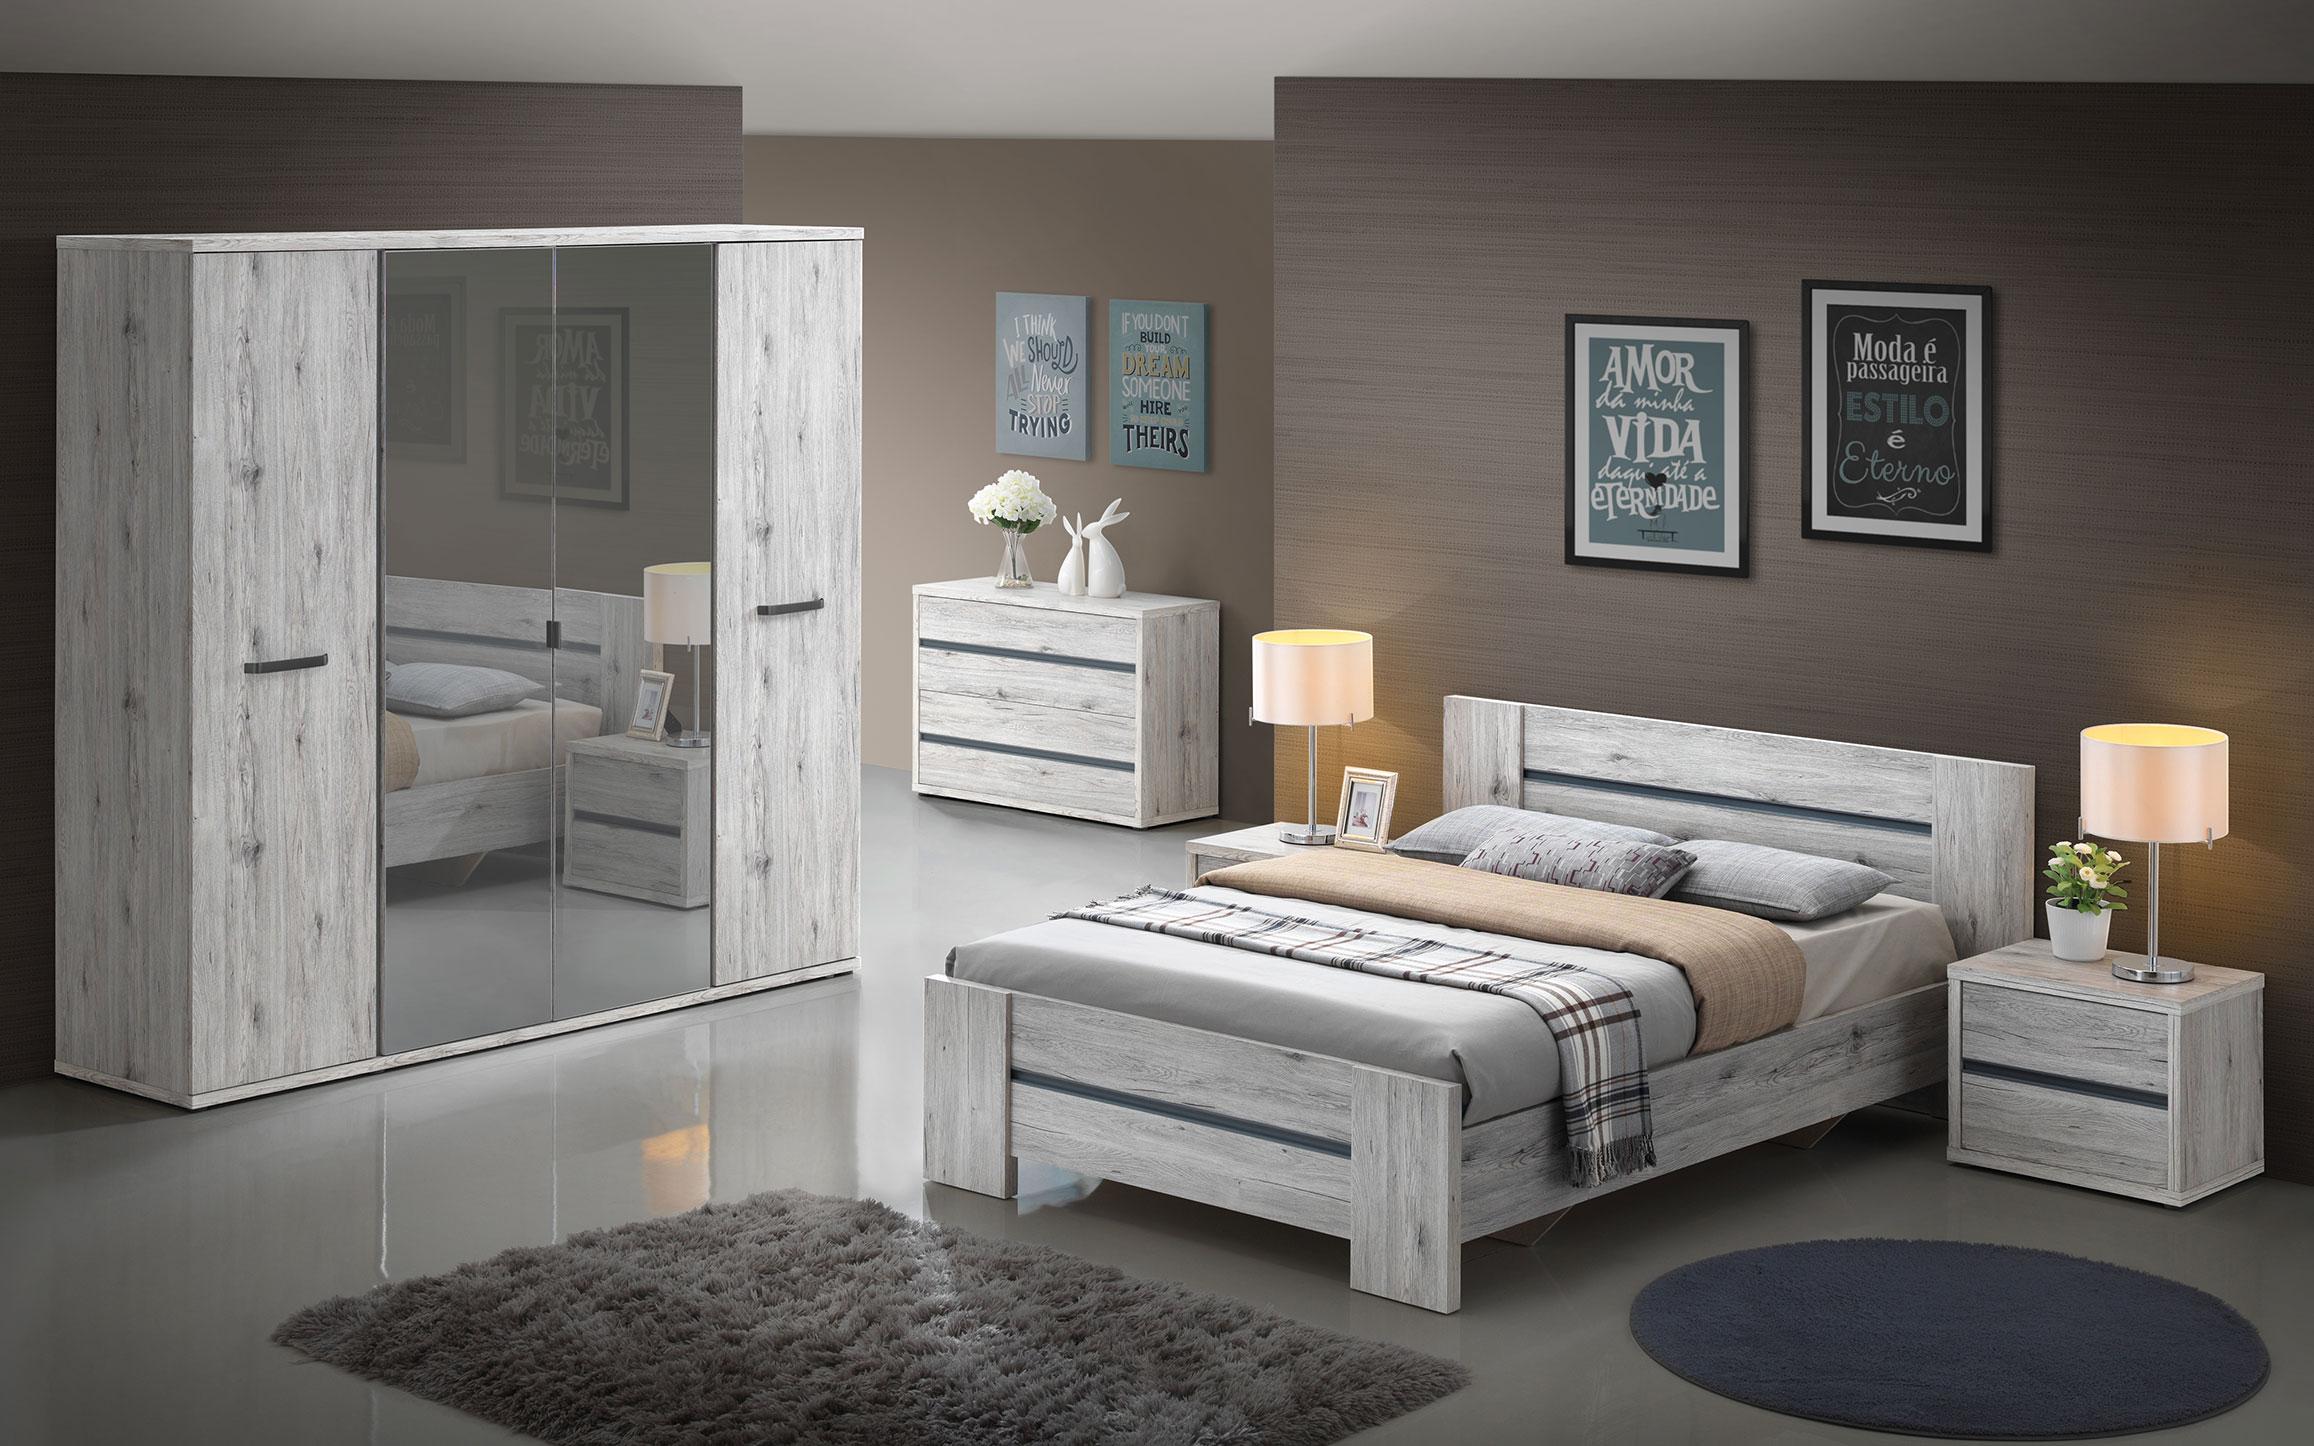 Slaapkamer Evi, bed 160x200cm + 2 nachttafels + kommode + kast 2 schuifdeuren